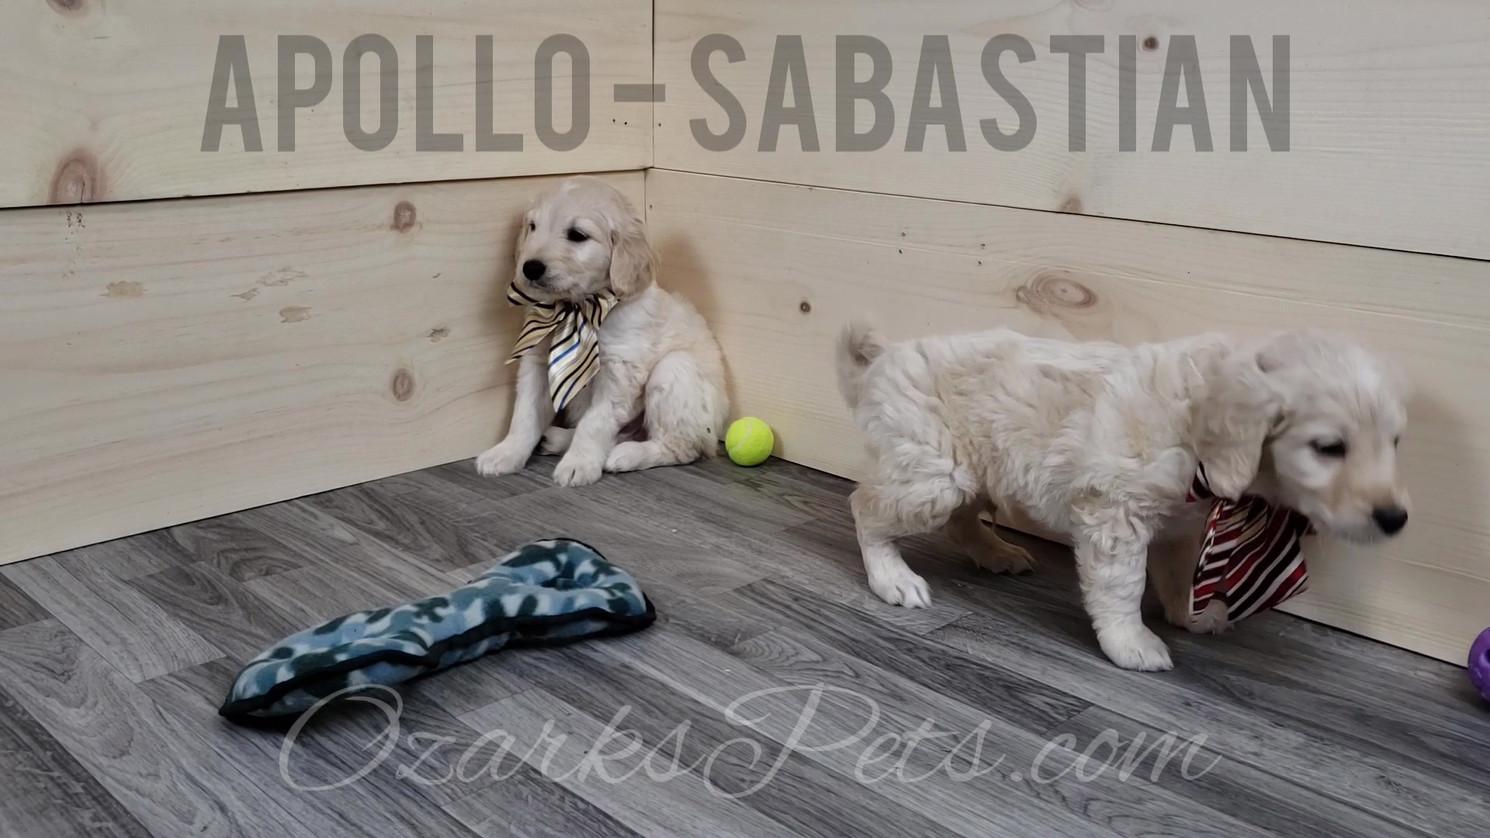 Apollo Sabastian.mp4